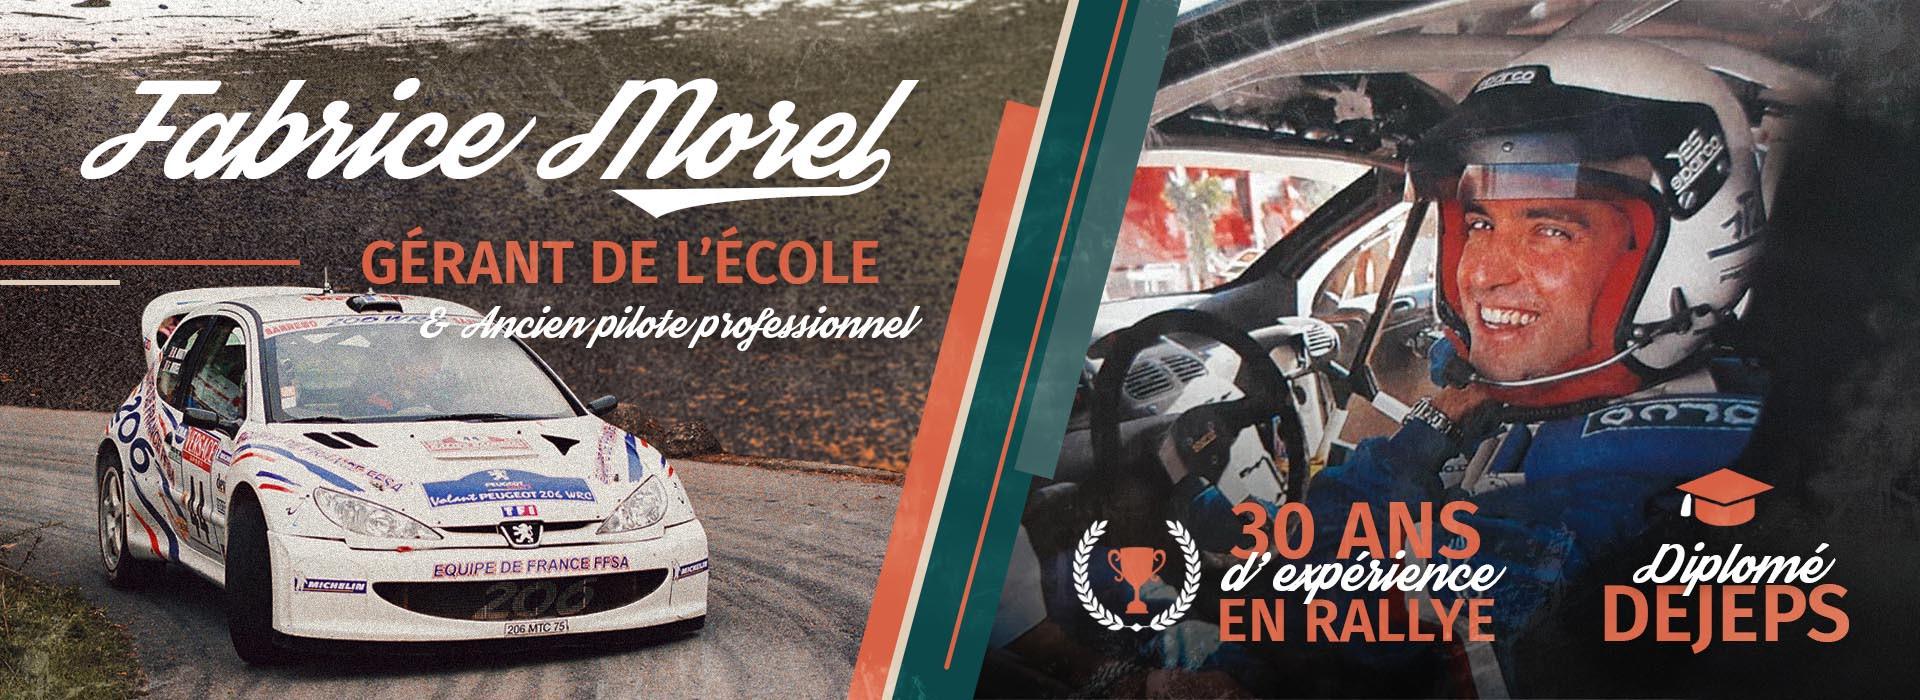 Fabrice Morel